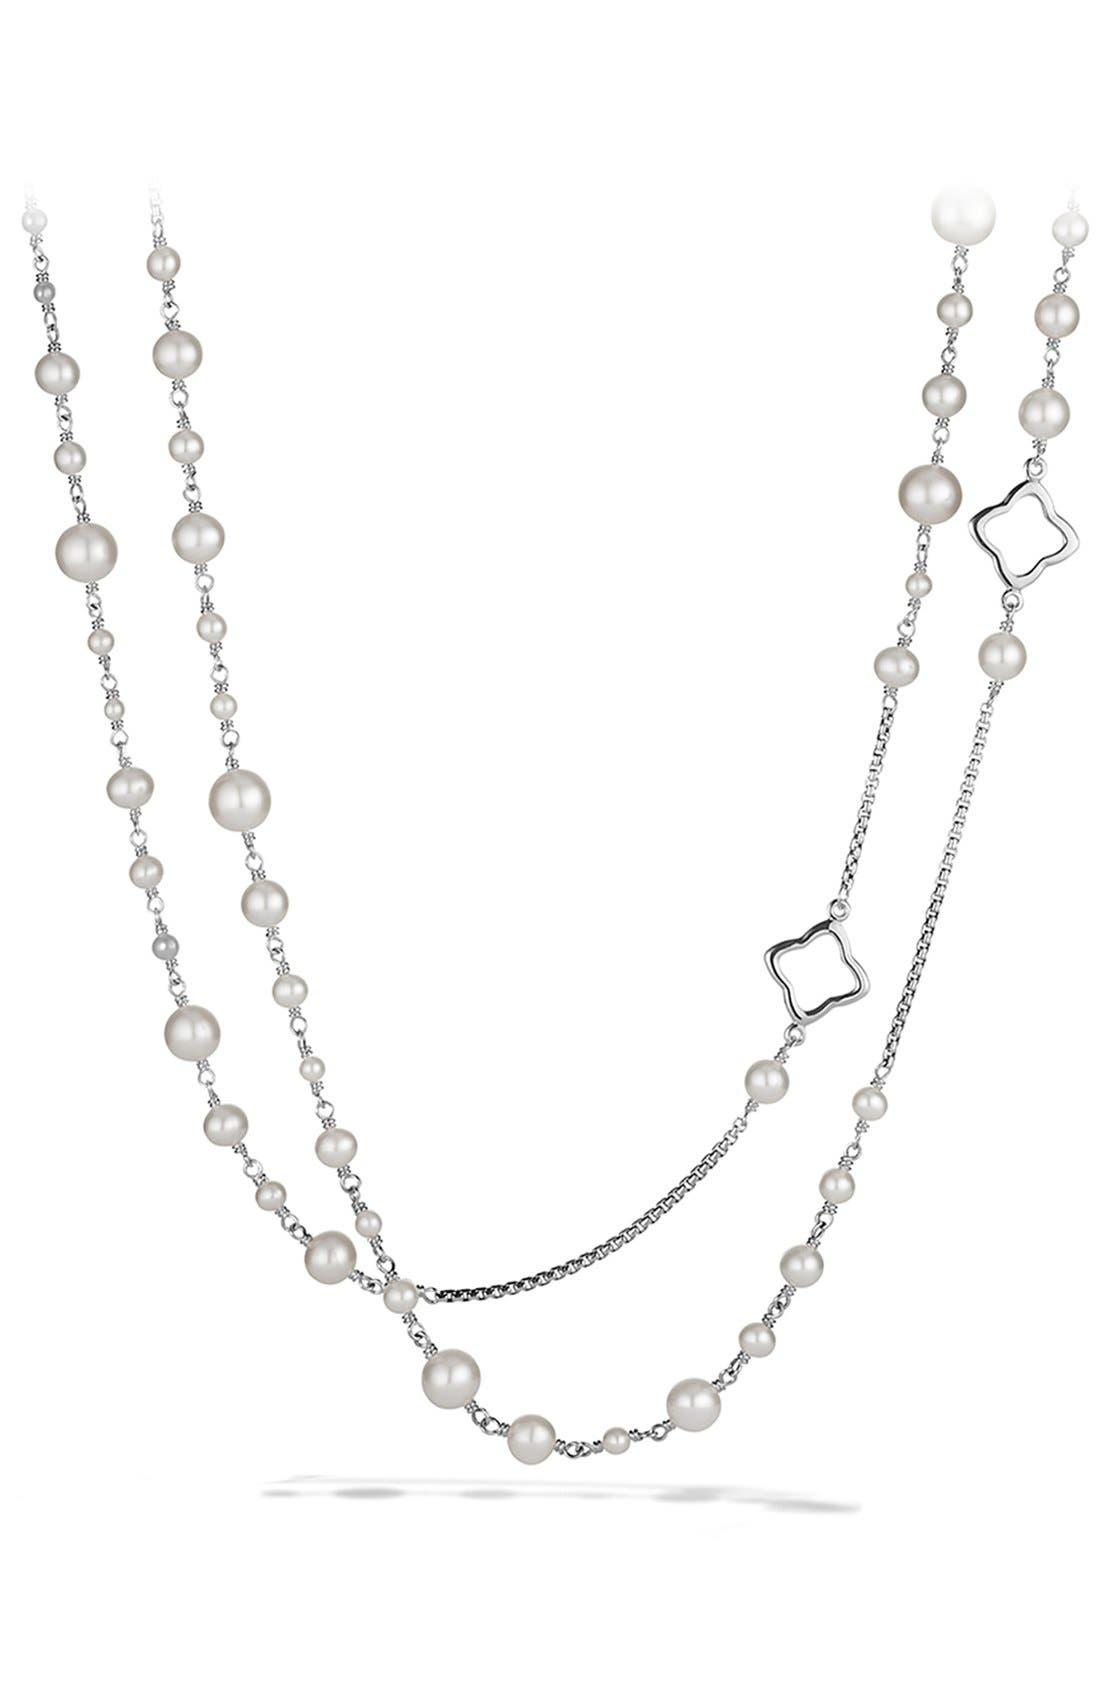 DAVID YURMAN, Pearl Chain Necklace, Main thumbnail 1, color, PEARL